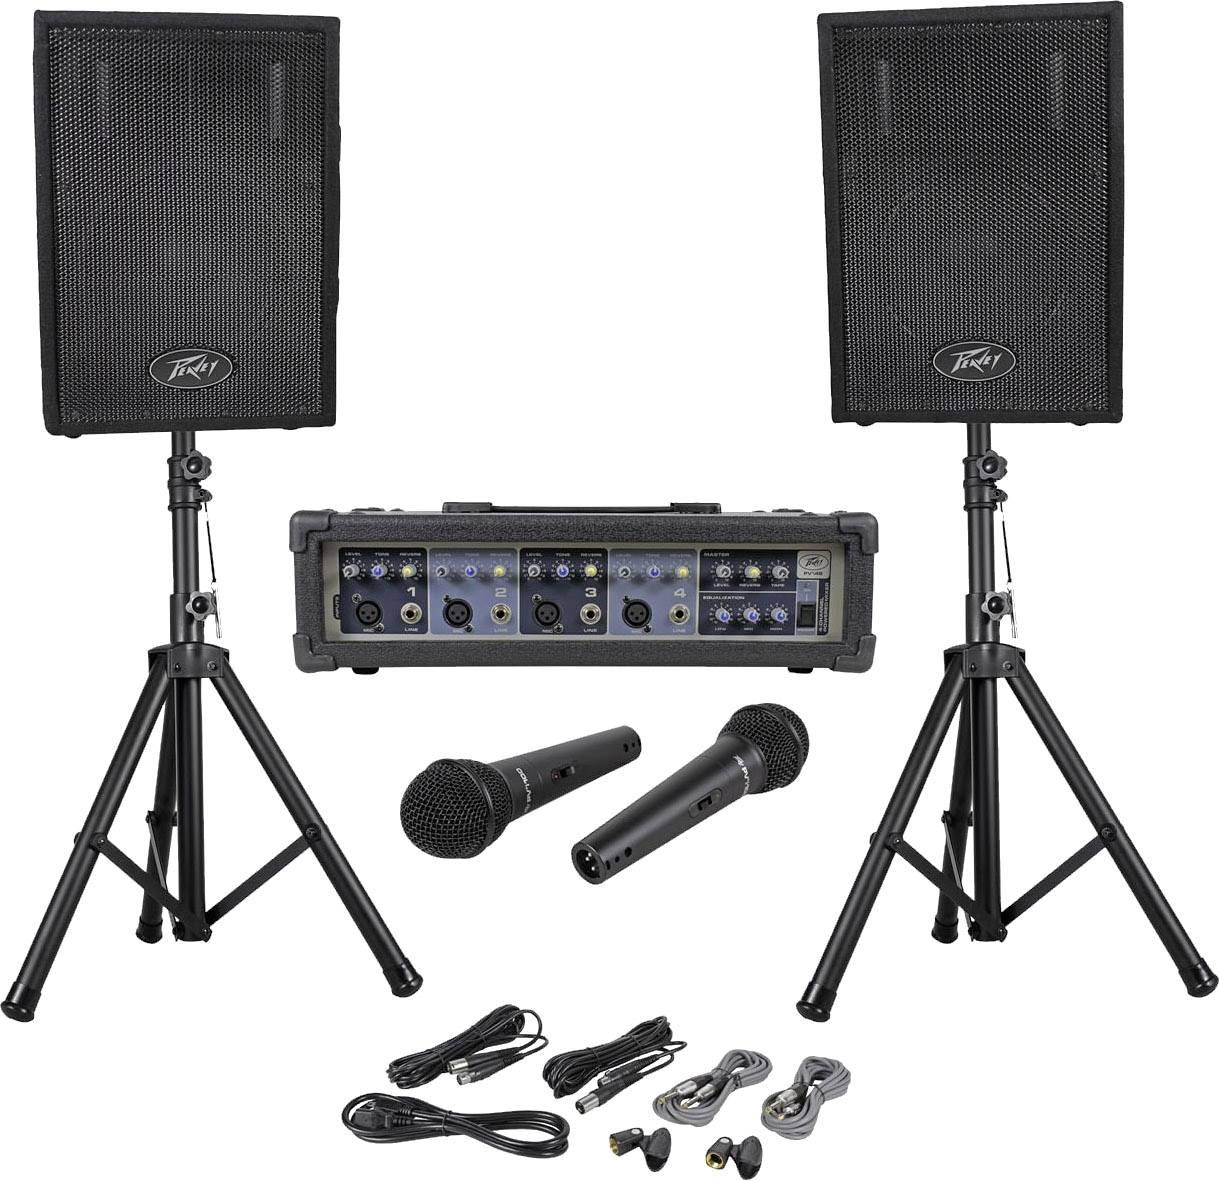 Sada PA systému Peavey Audio Performer Pack